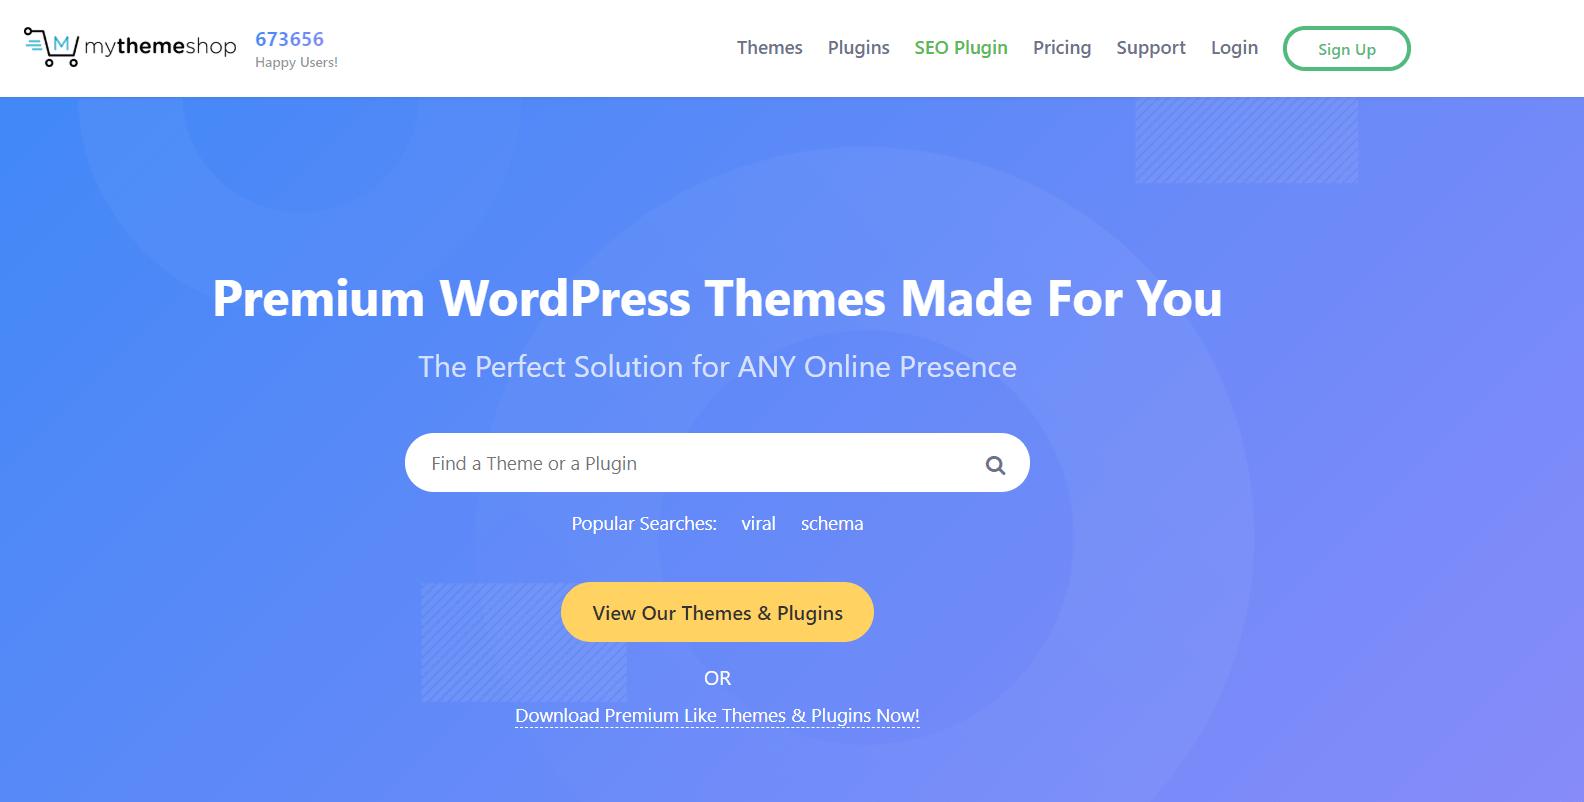 My ThemeShop Black Friday Deals- Premium WordPress Themes